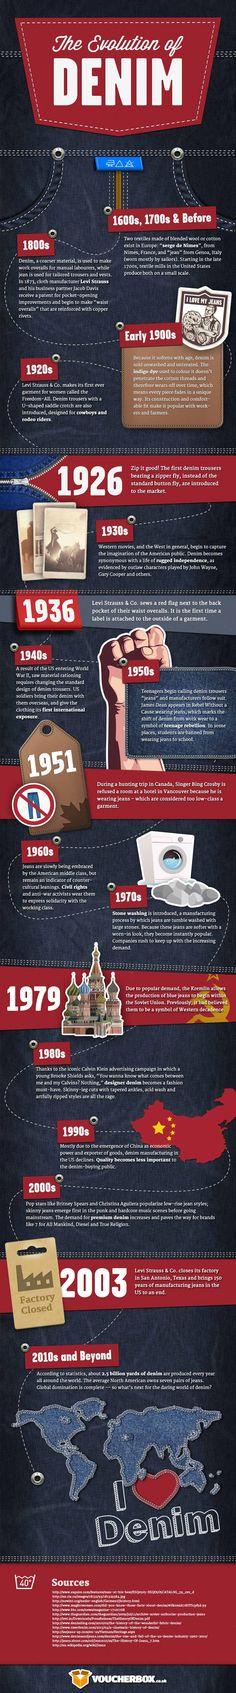 This denim infographic is jean-ius! #humblebrag #denim #fashion #history